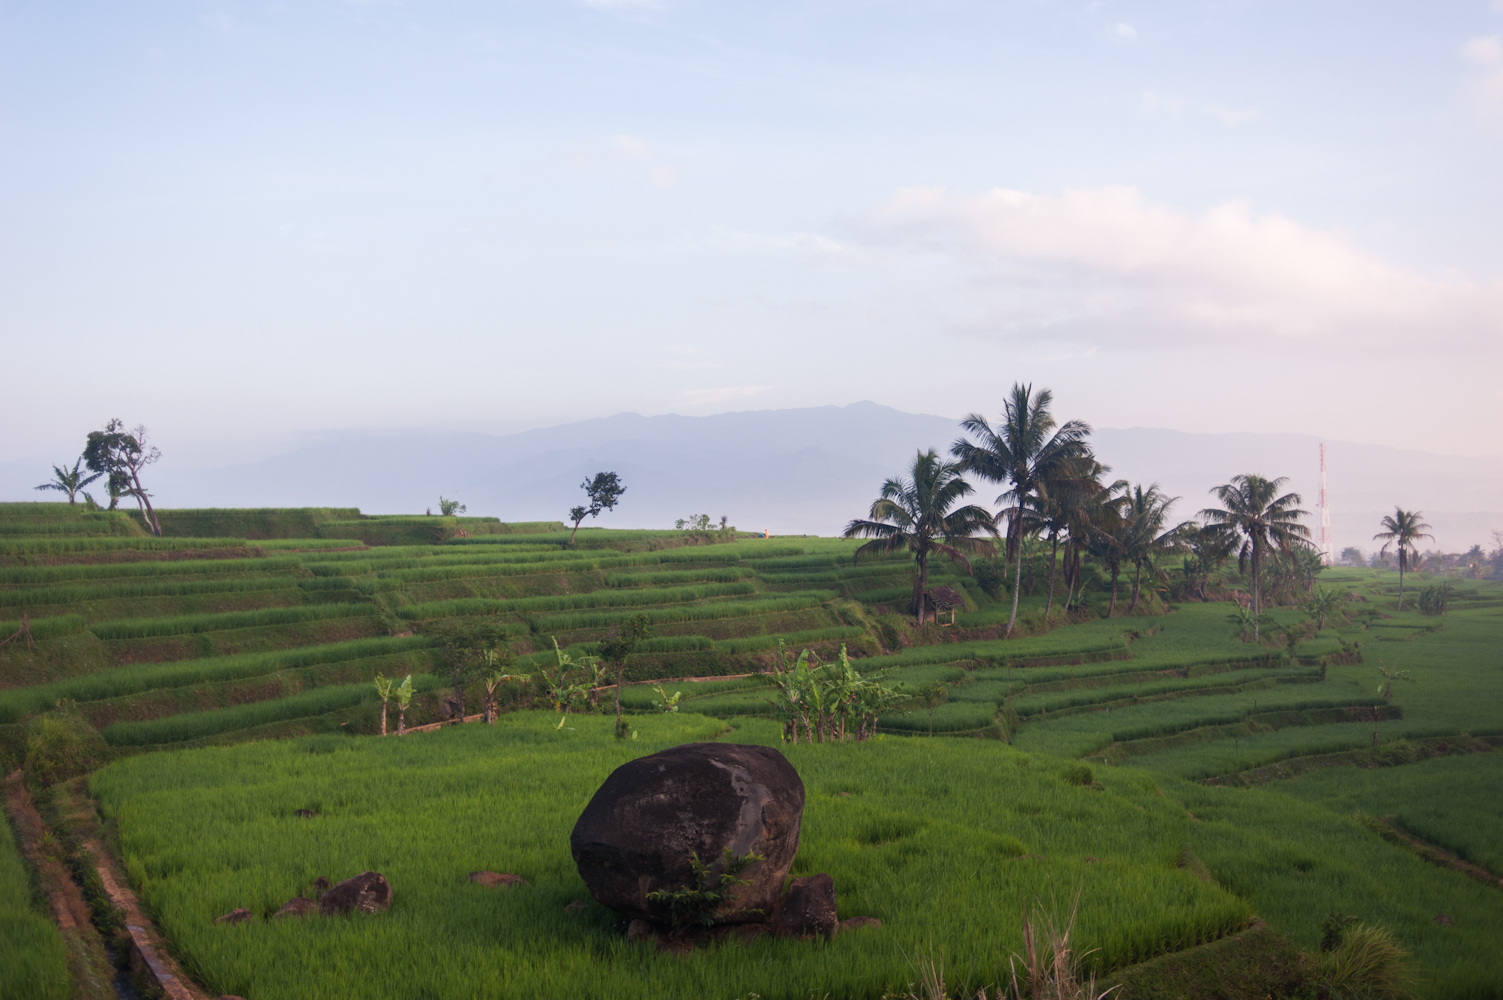 20120726_KEVINMICHAELBRIGGS_indonesia_001-6.jpg